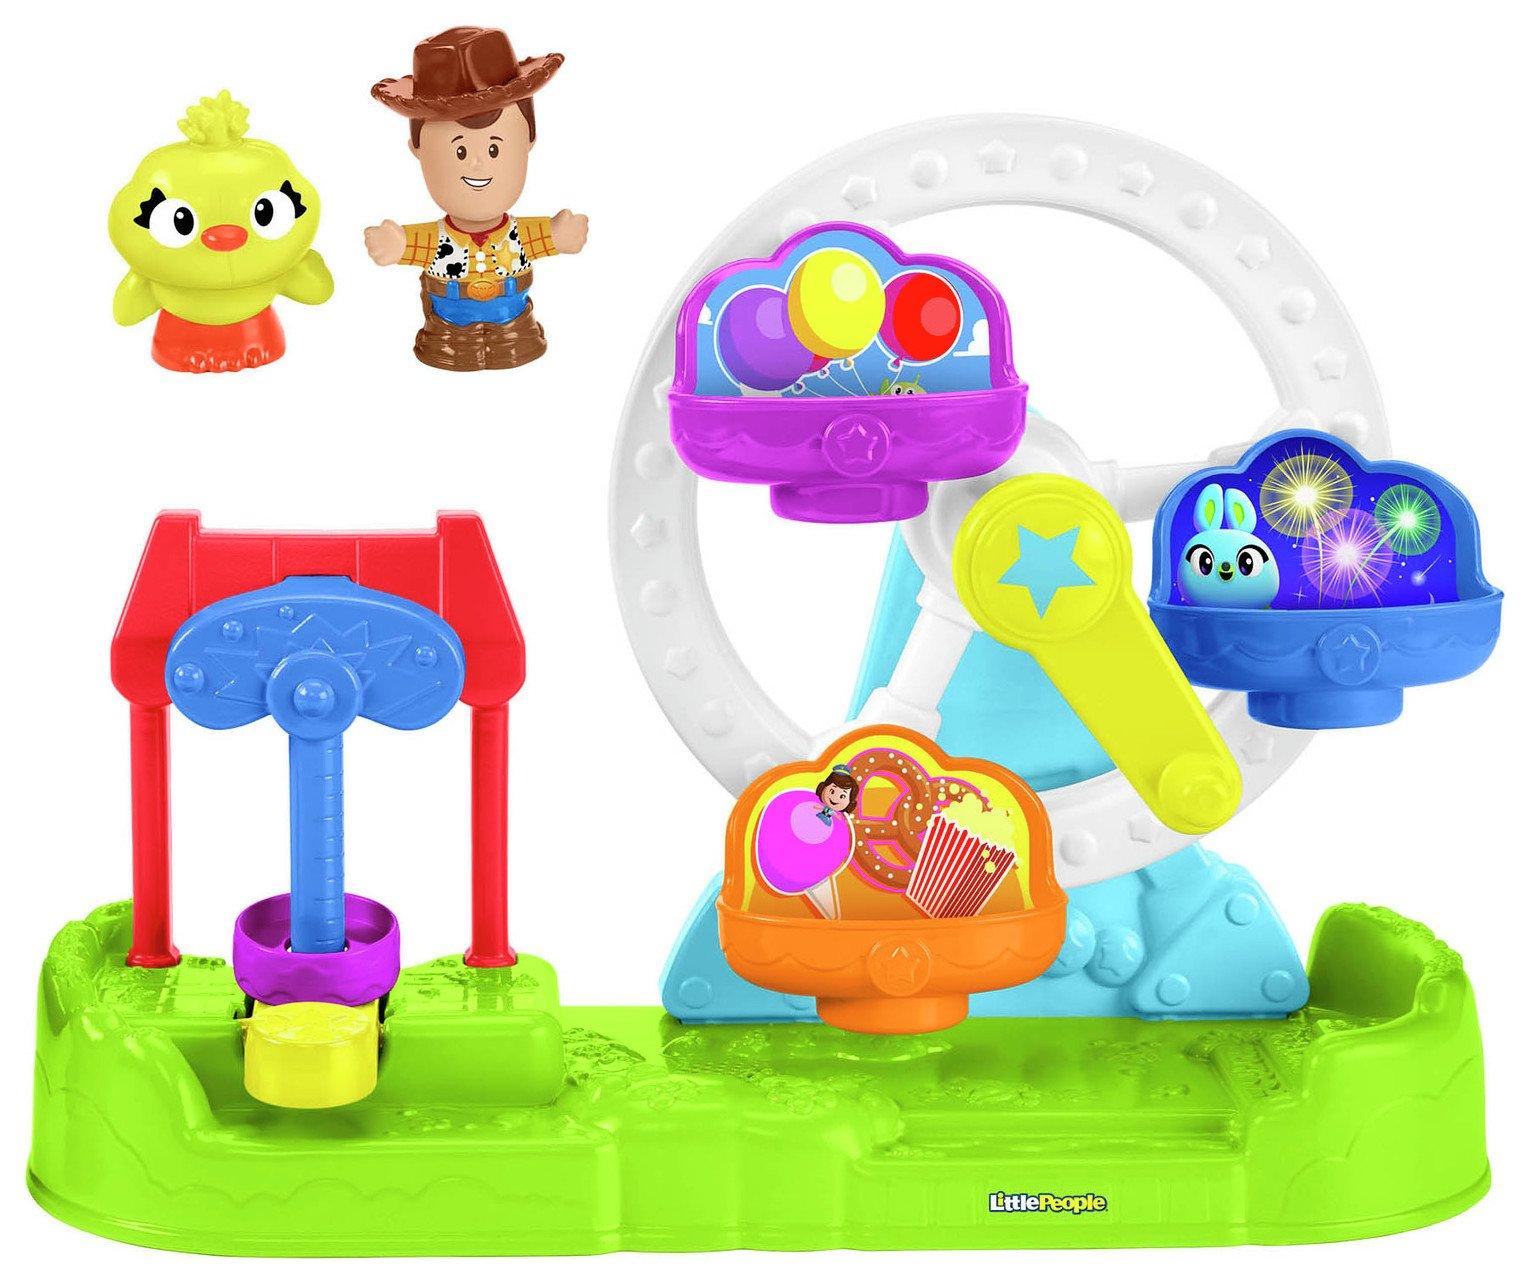 Toy Story 4 Little People Ferris Wheel Playset